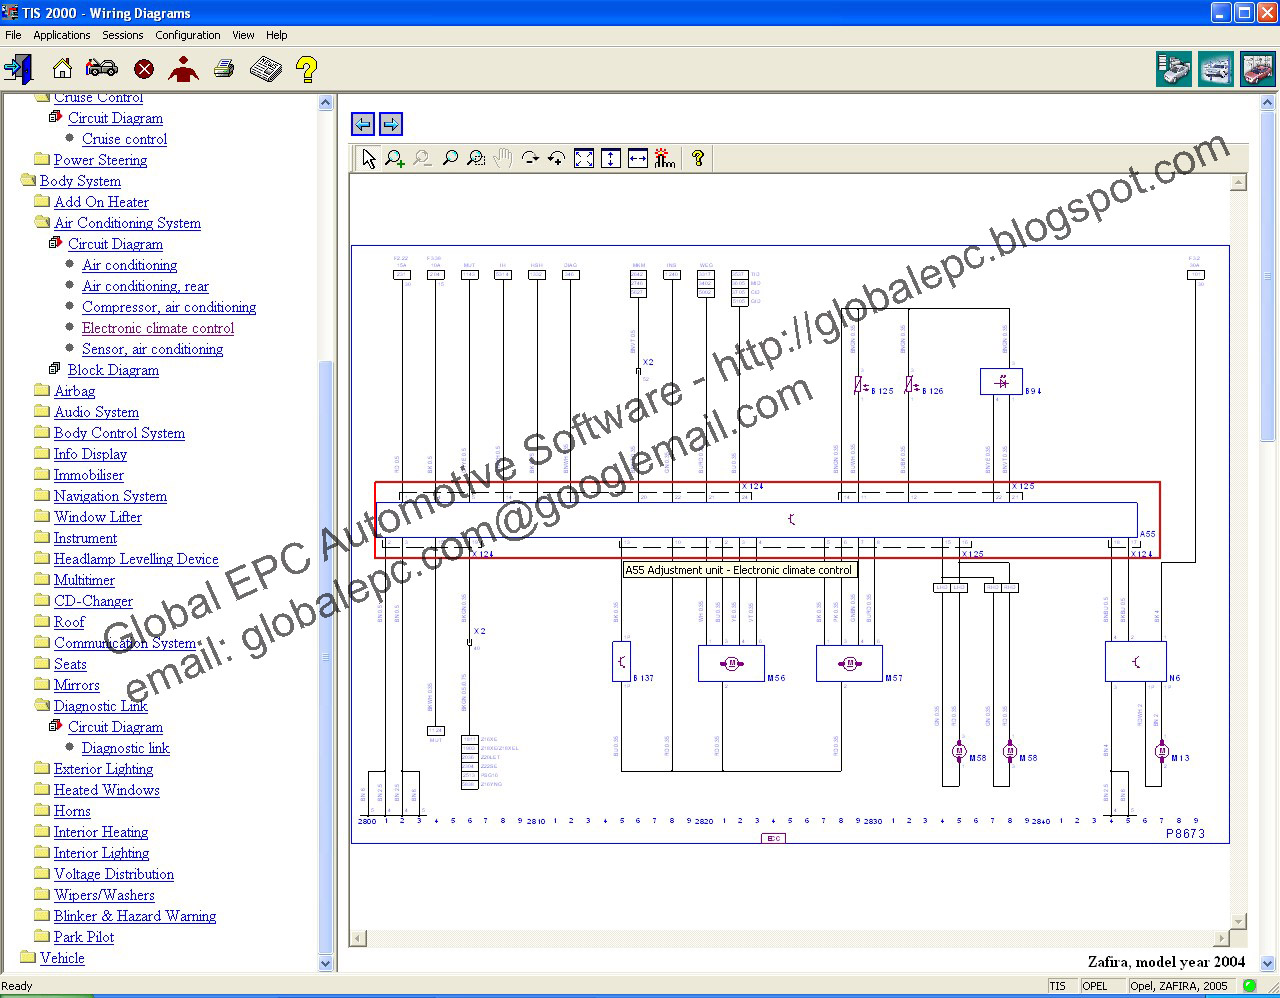 tis wiring diagrams uk wiring diagrams, Wiring diagram